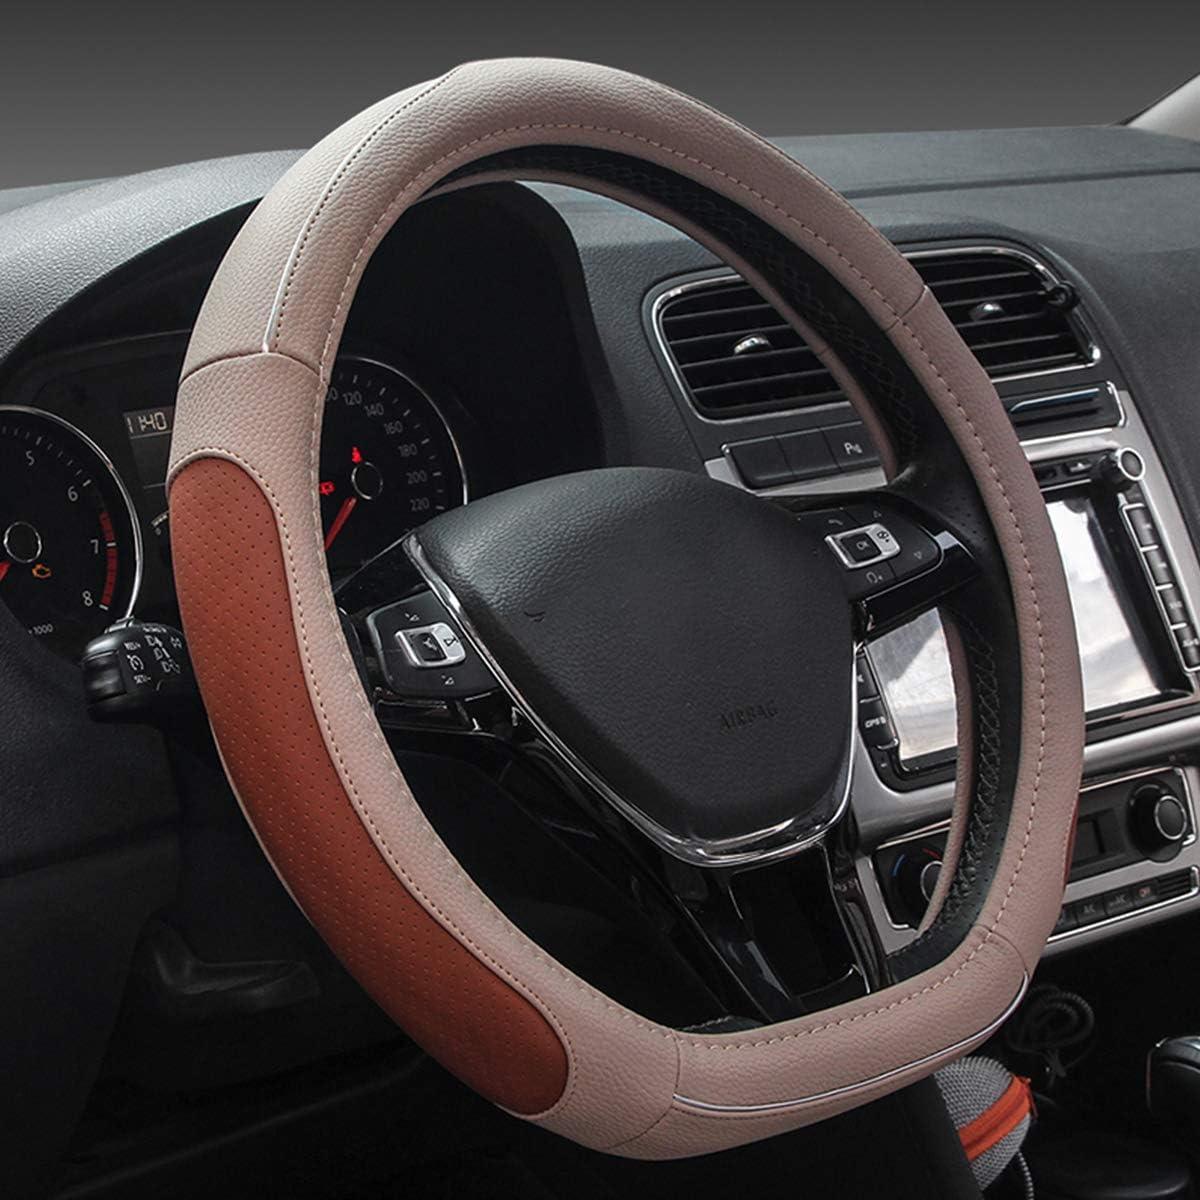 15 Ergocar Car Steering Wheel Cover Non-slip Car Steering Wheel Protector Sport D-shape Carbon Fiber /& PU Leather Universal For Diameter 38cm Black